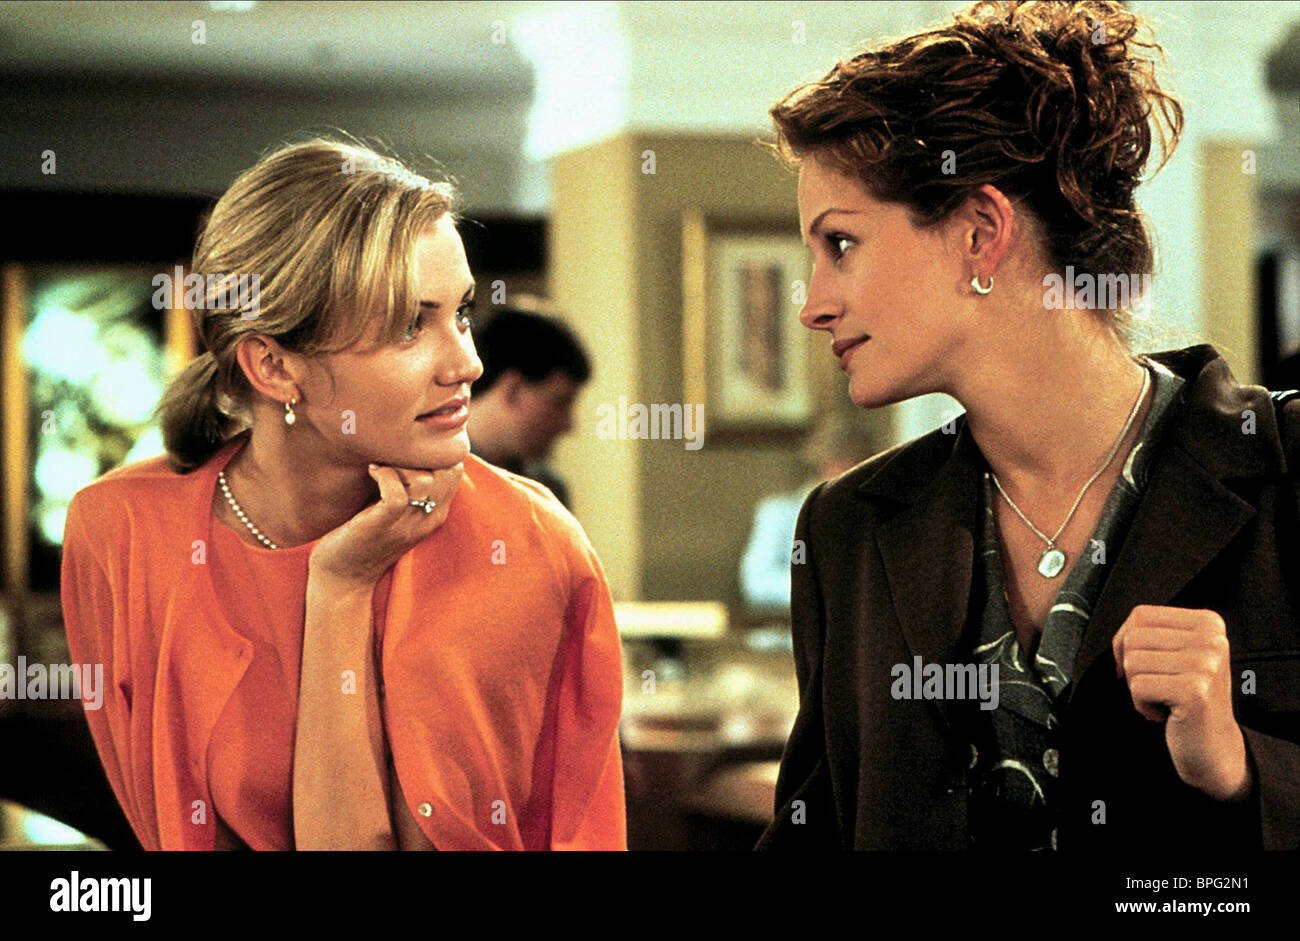 Cameron Diaz Julia Roberts My Best Friend S Wedding 1997 Stock Photo Alamy